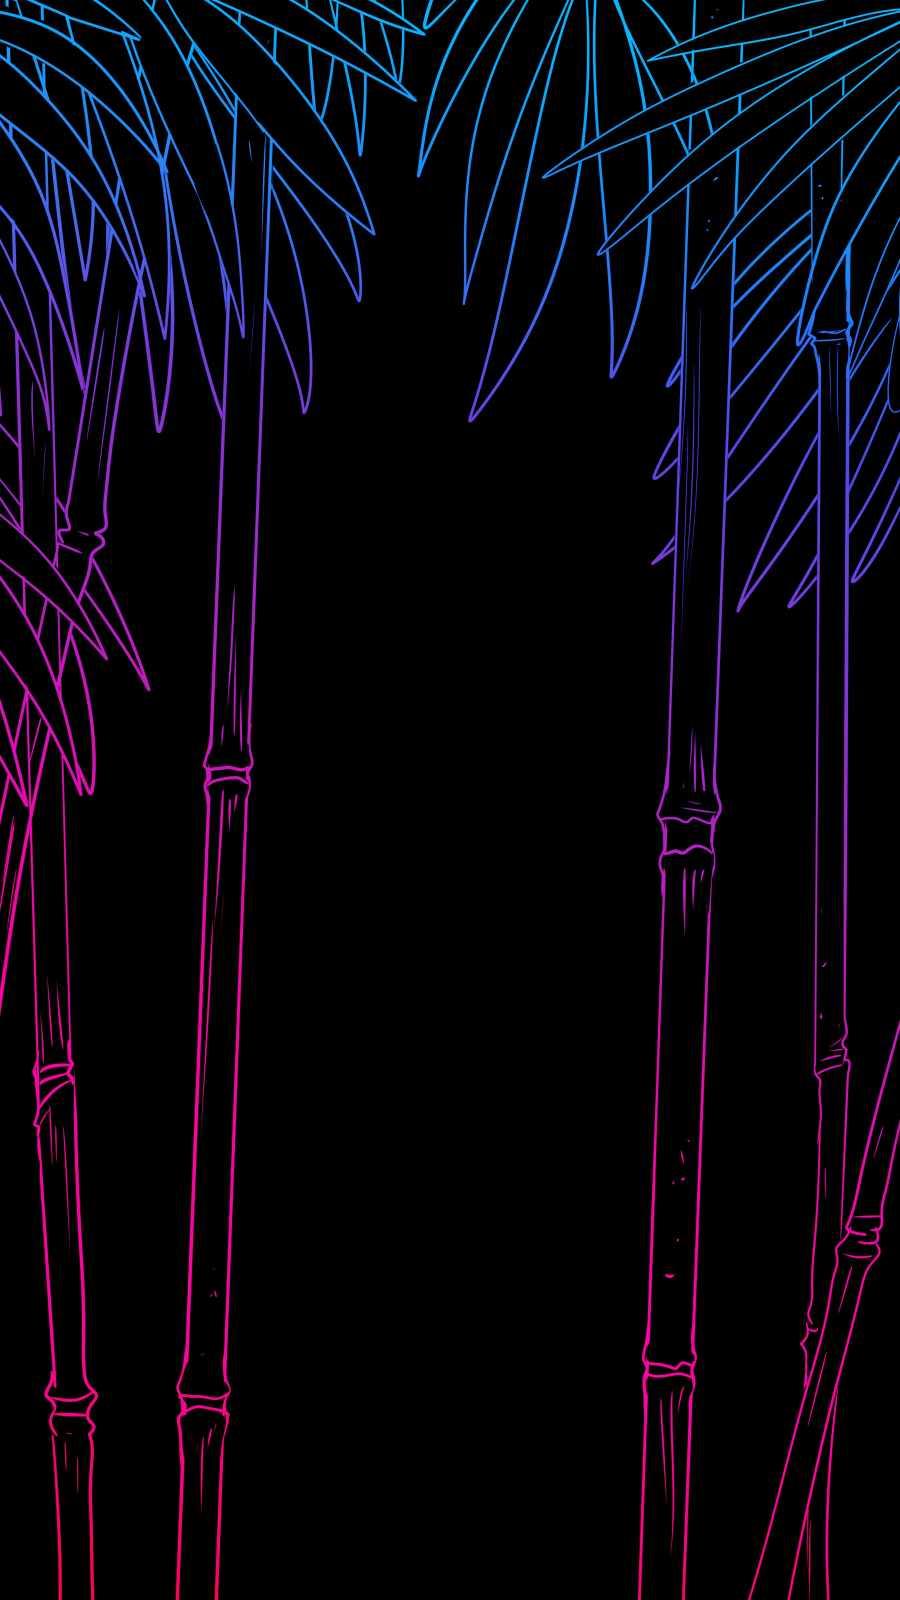 Amoled Bamboo Tree iPhone Wallpaper